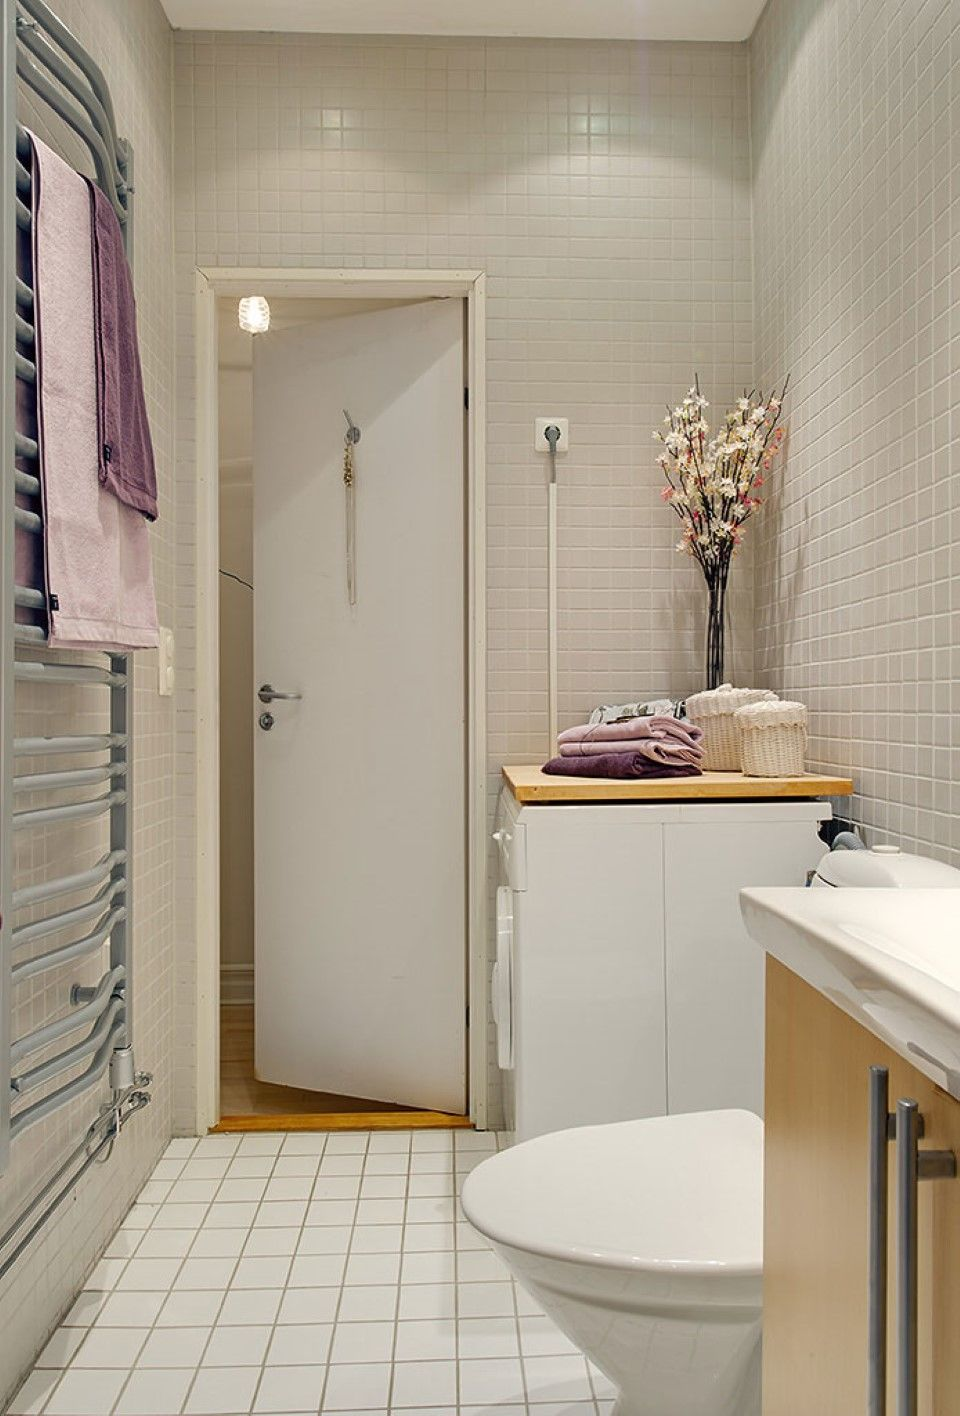 contemporary floor tiles bathroom décor-Fascinating Floor Tiles Bathroom Concept